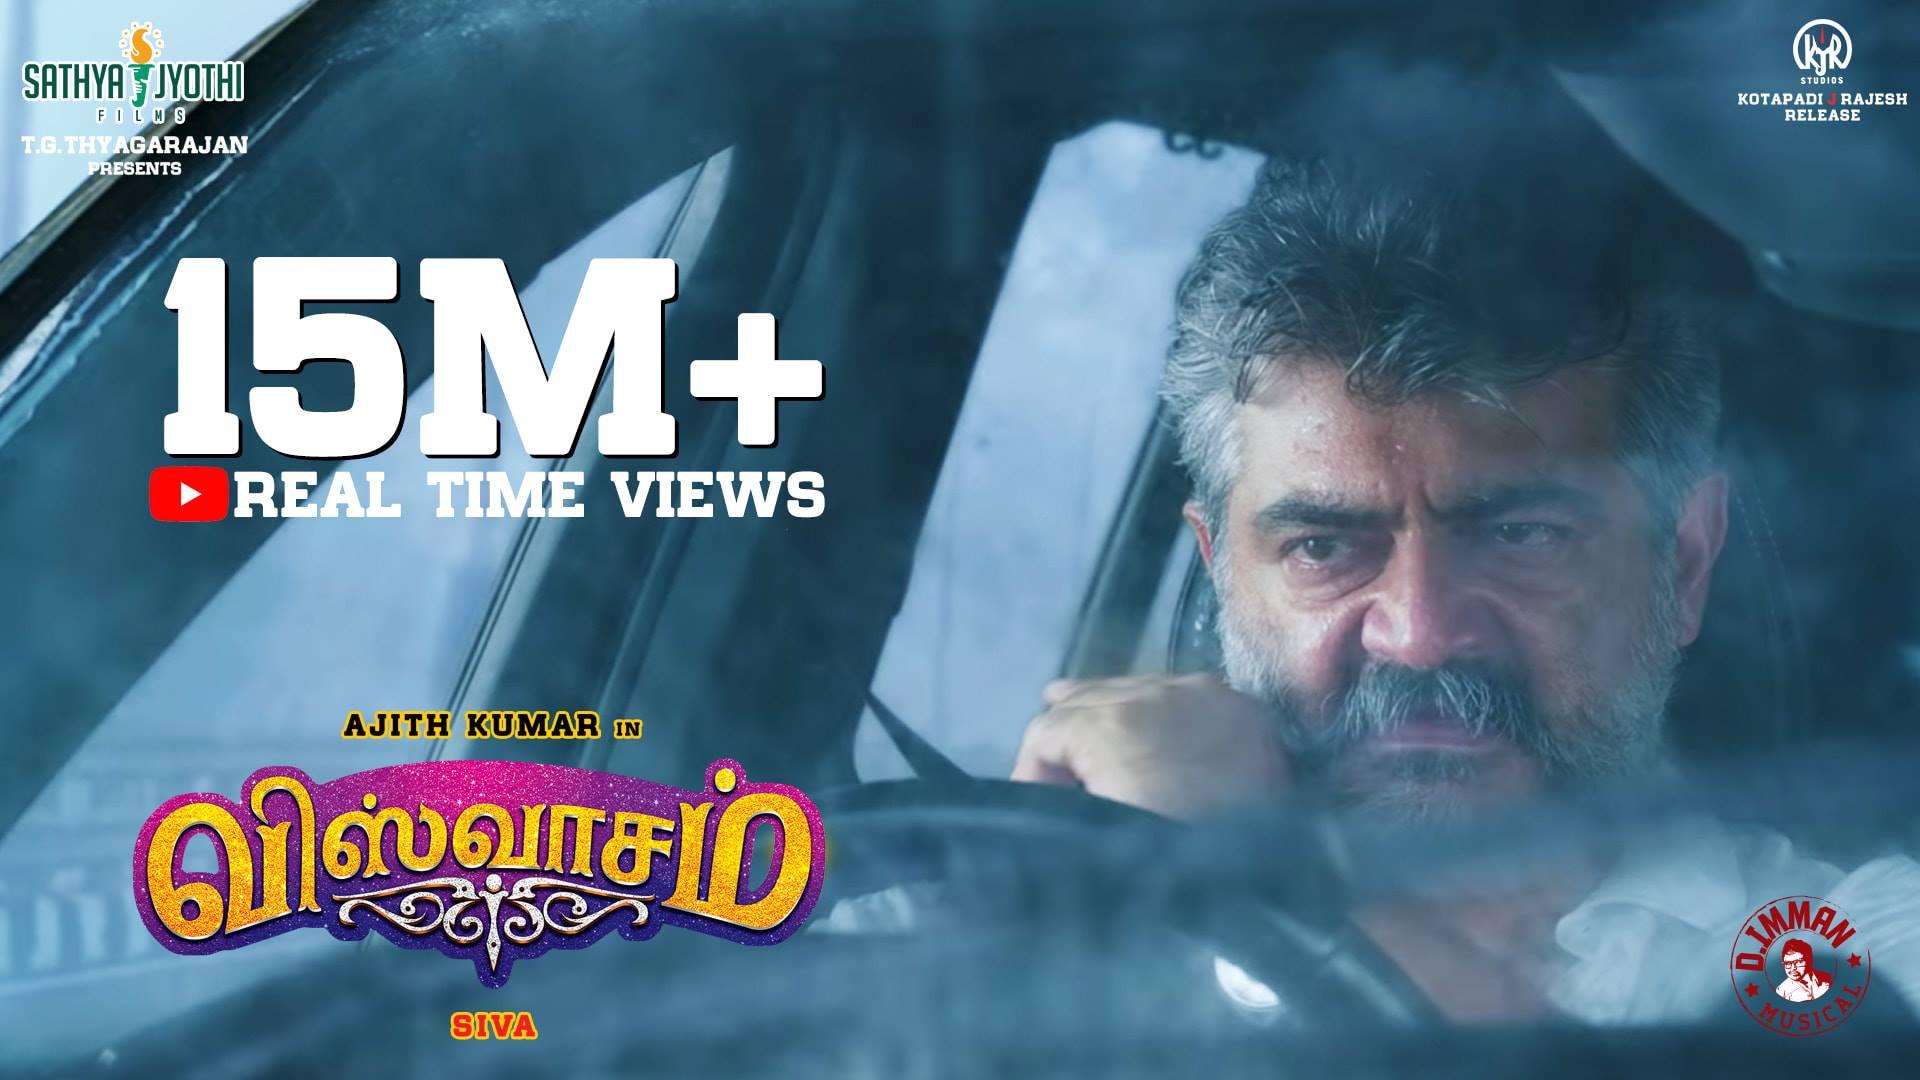 Viswasam trailer sets new record